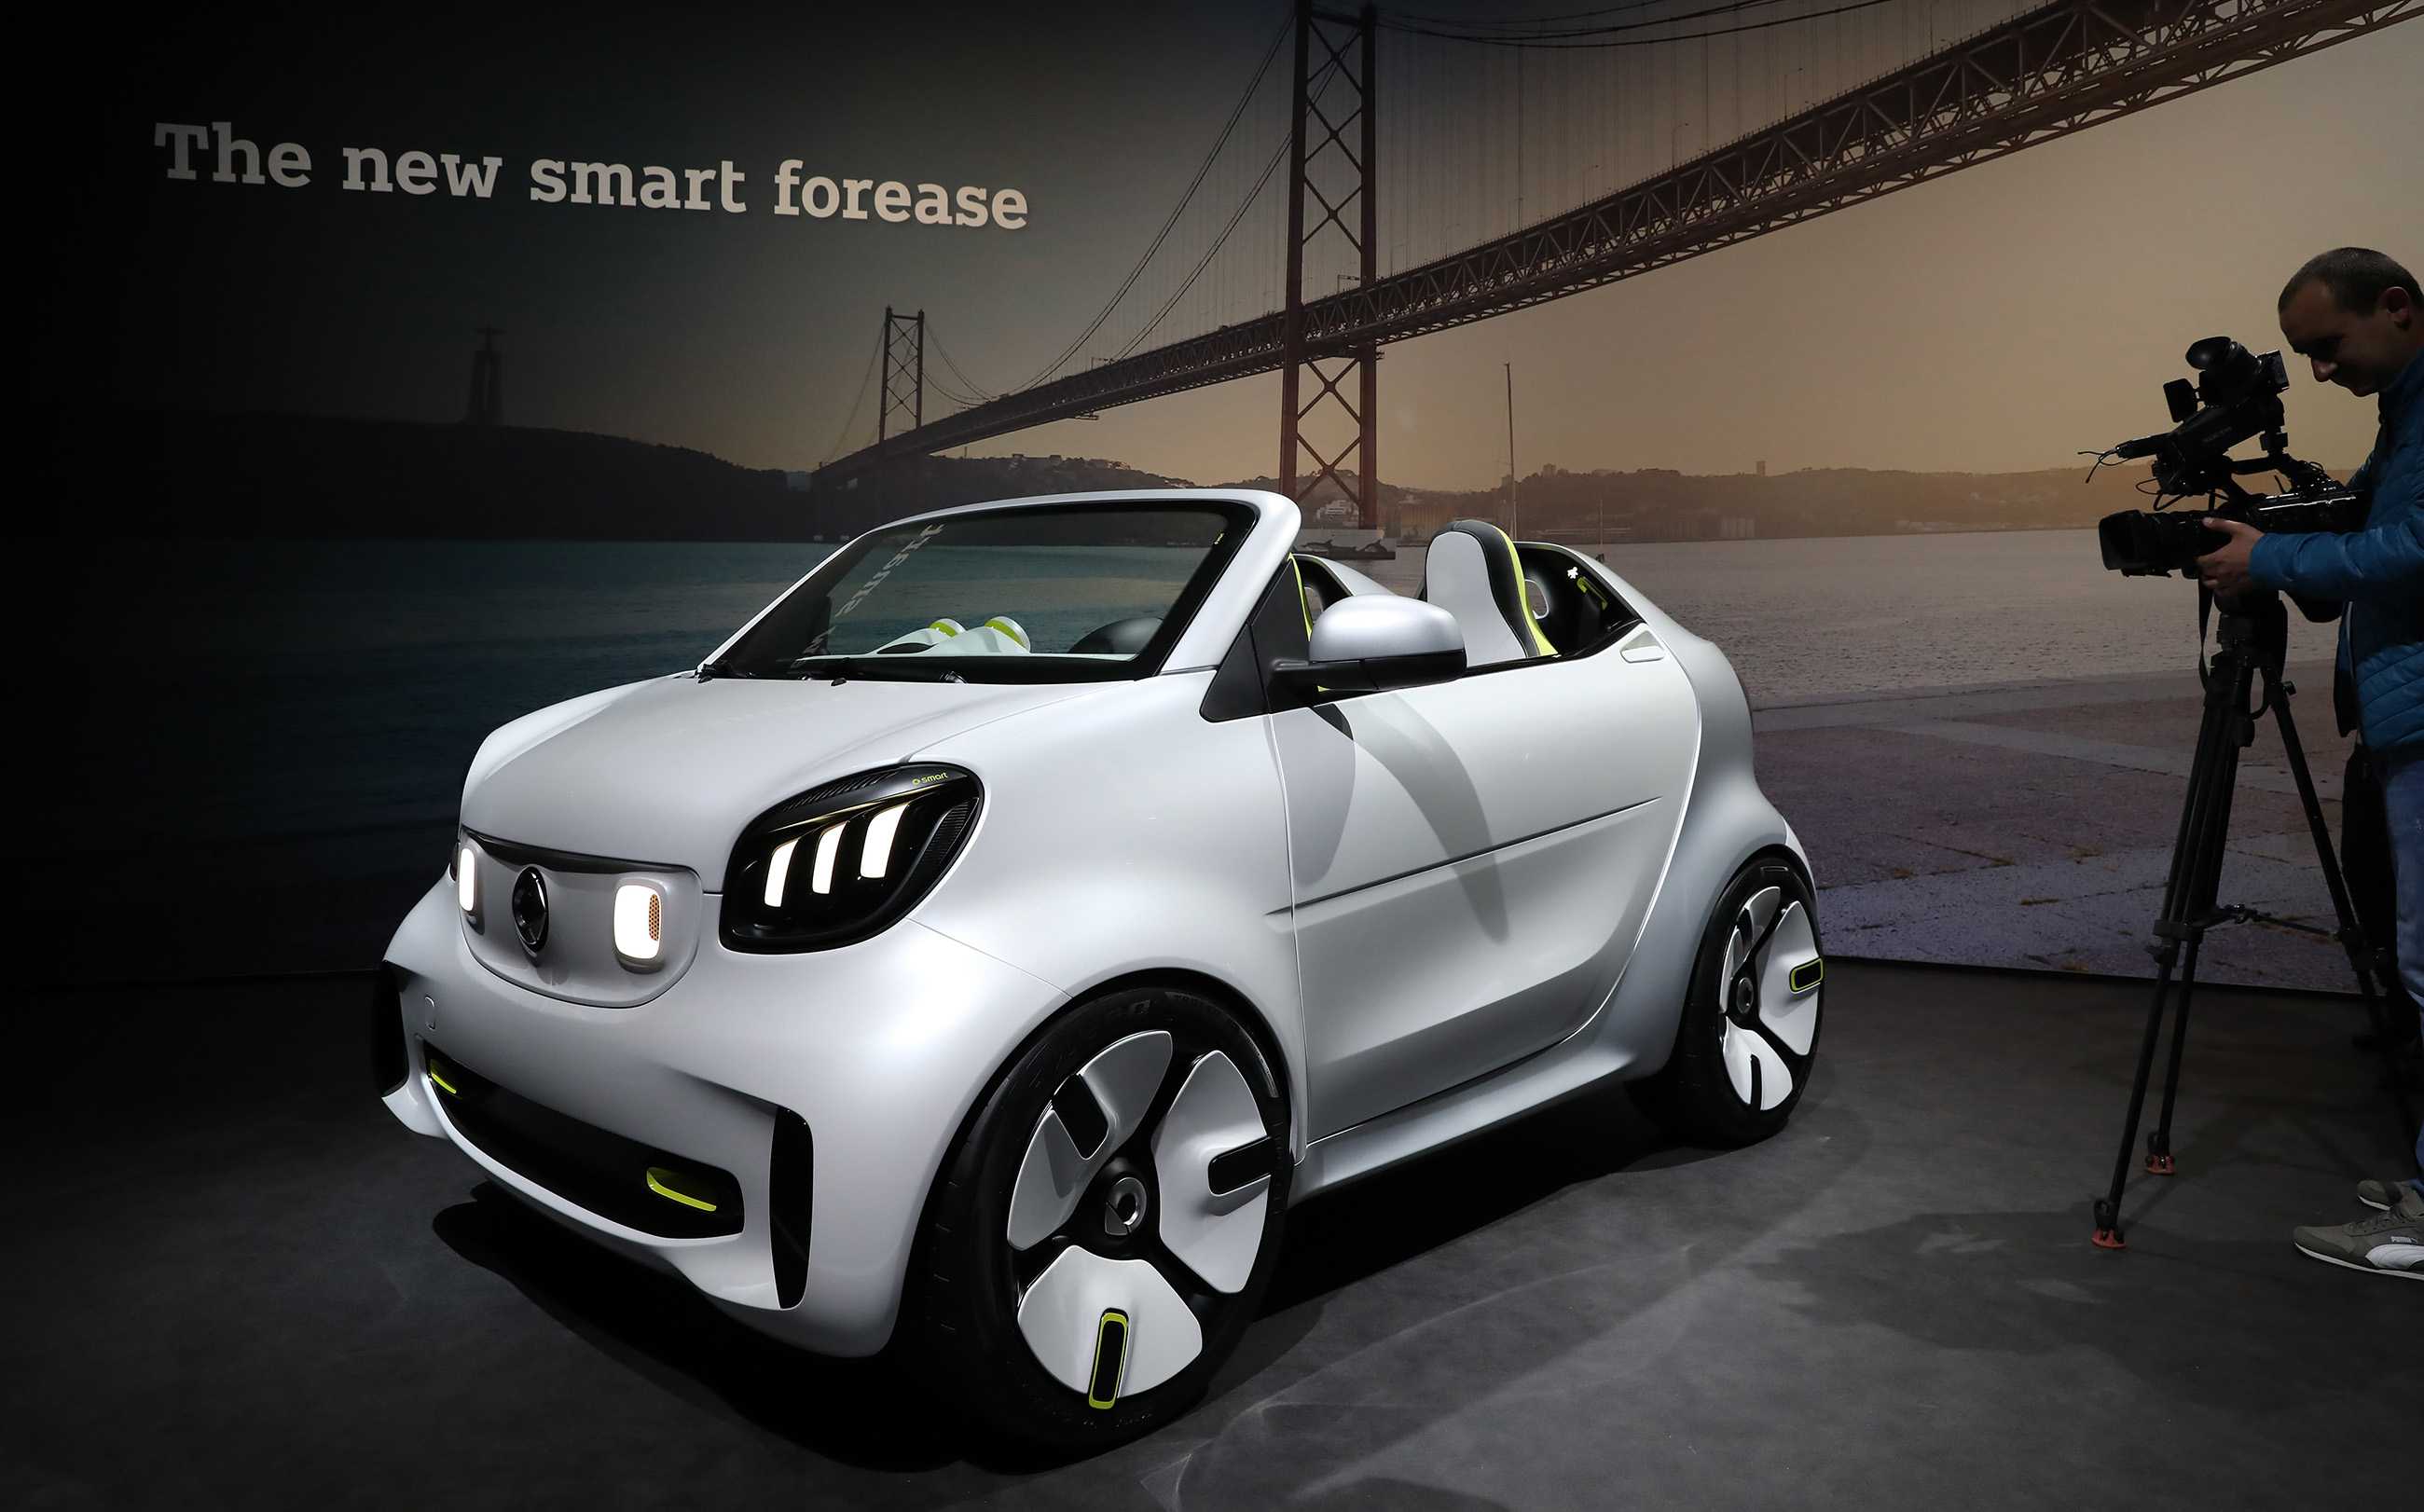 54e95fd63 شاهد | Smart السيارة التي ترفض الموت تتجه للصين